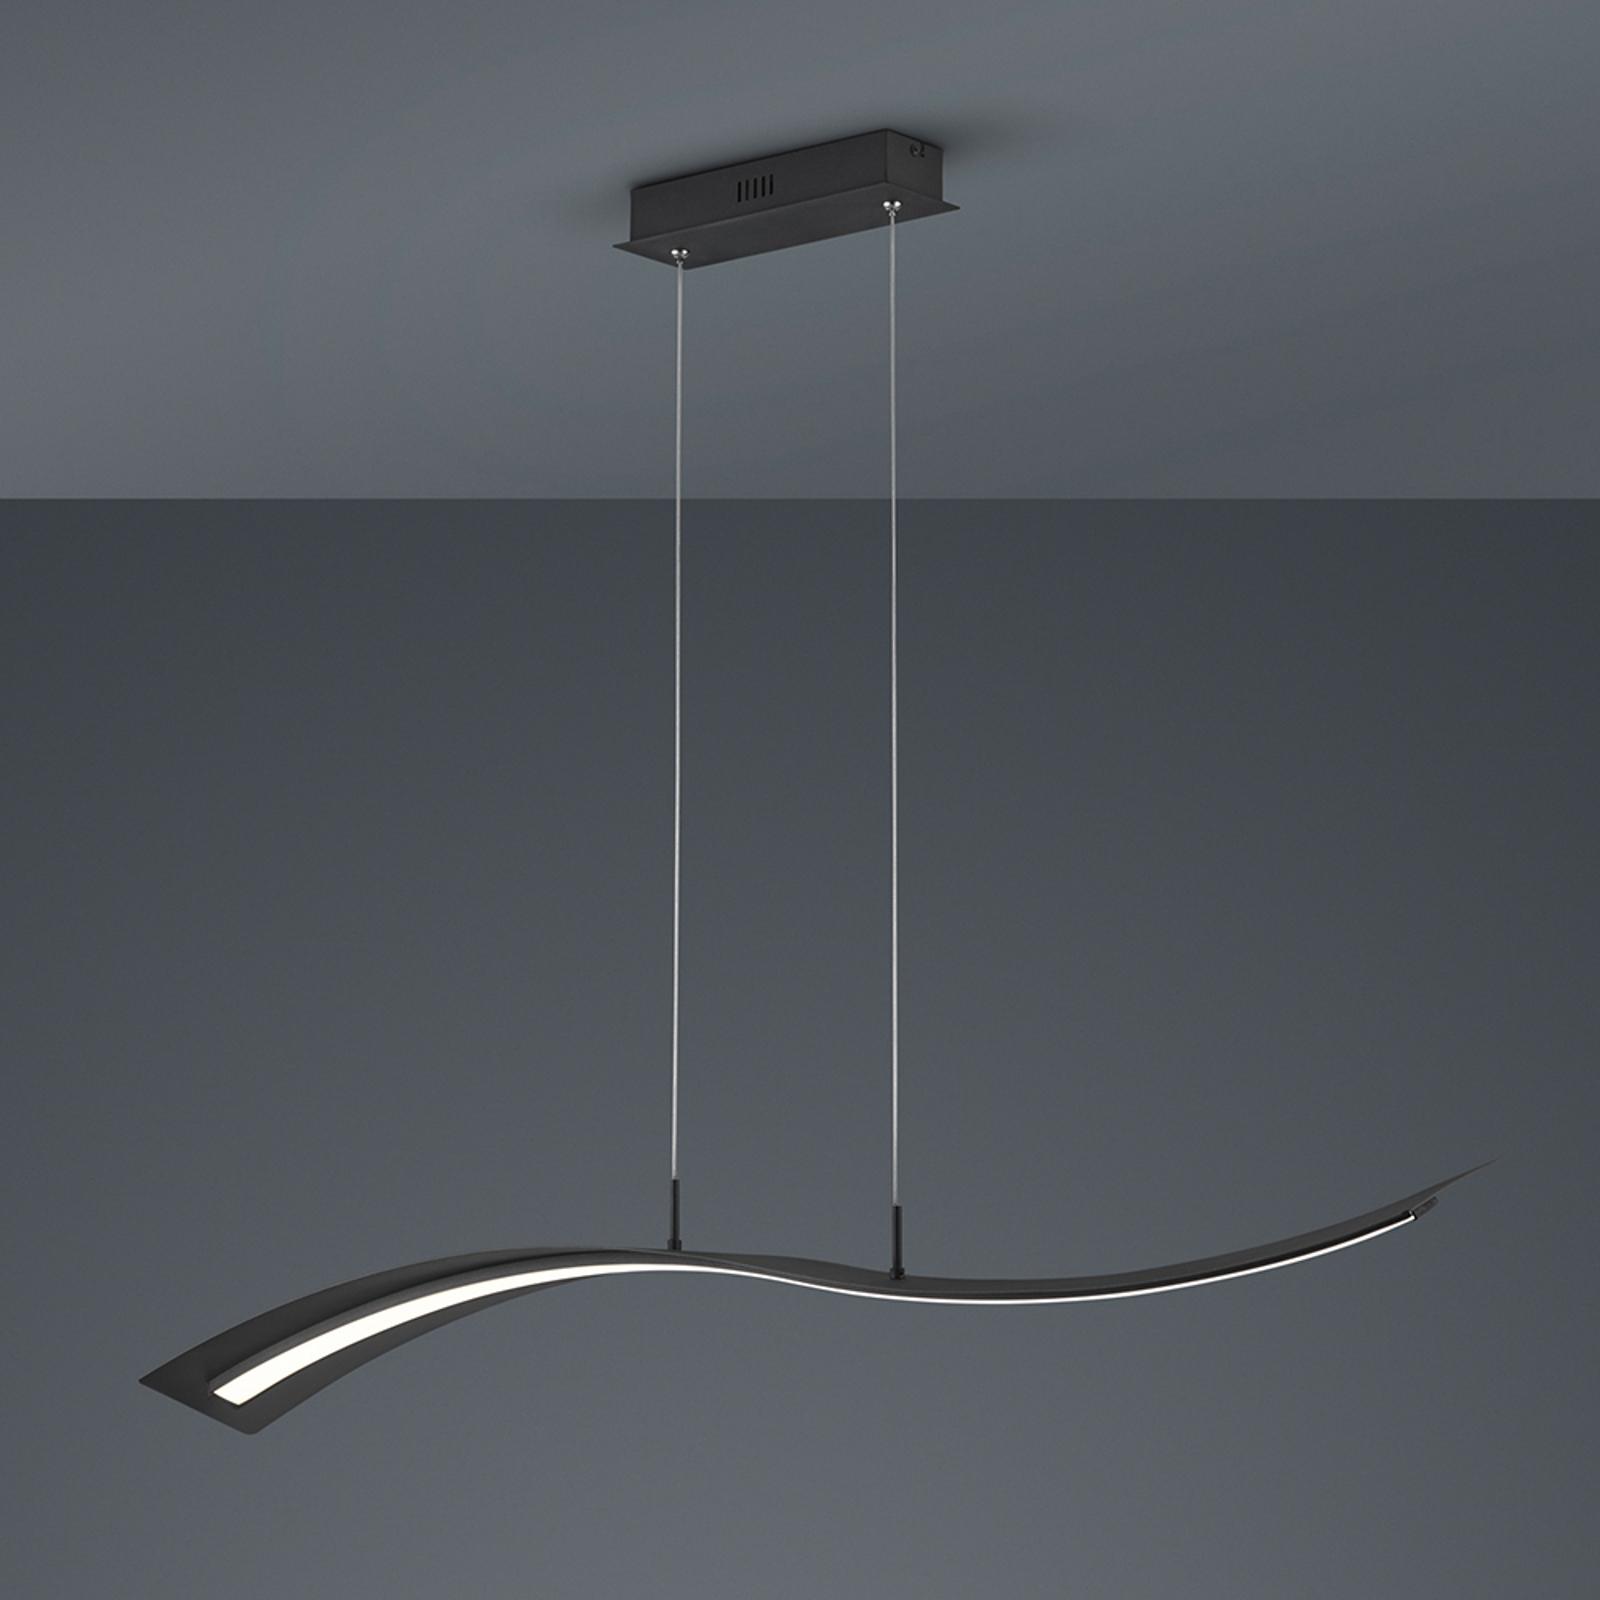 LED-riippuvalo Salerno, SwitchDim, matta musta